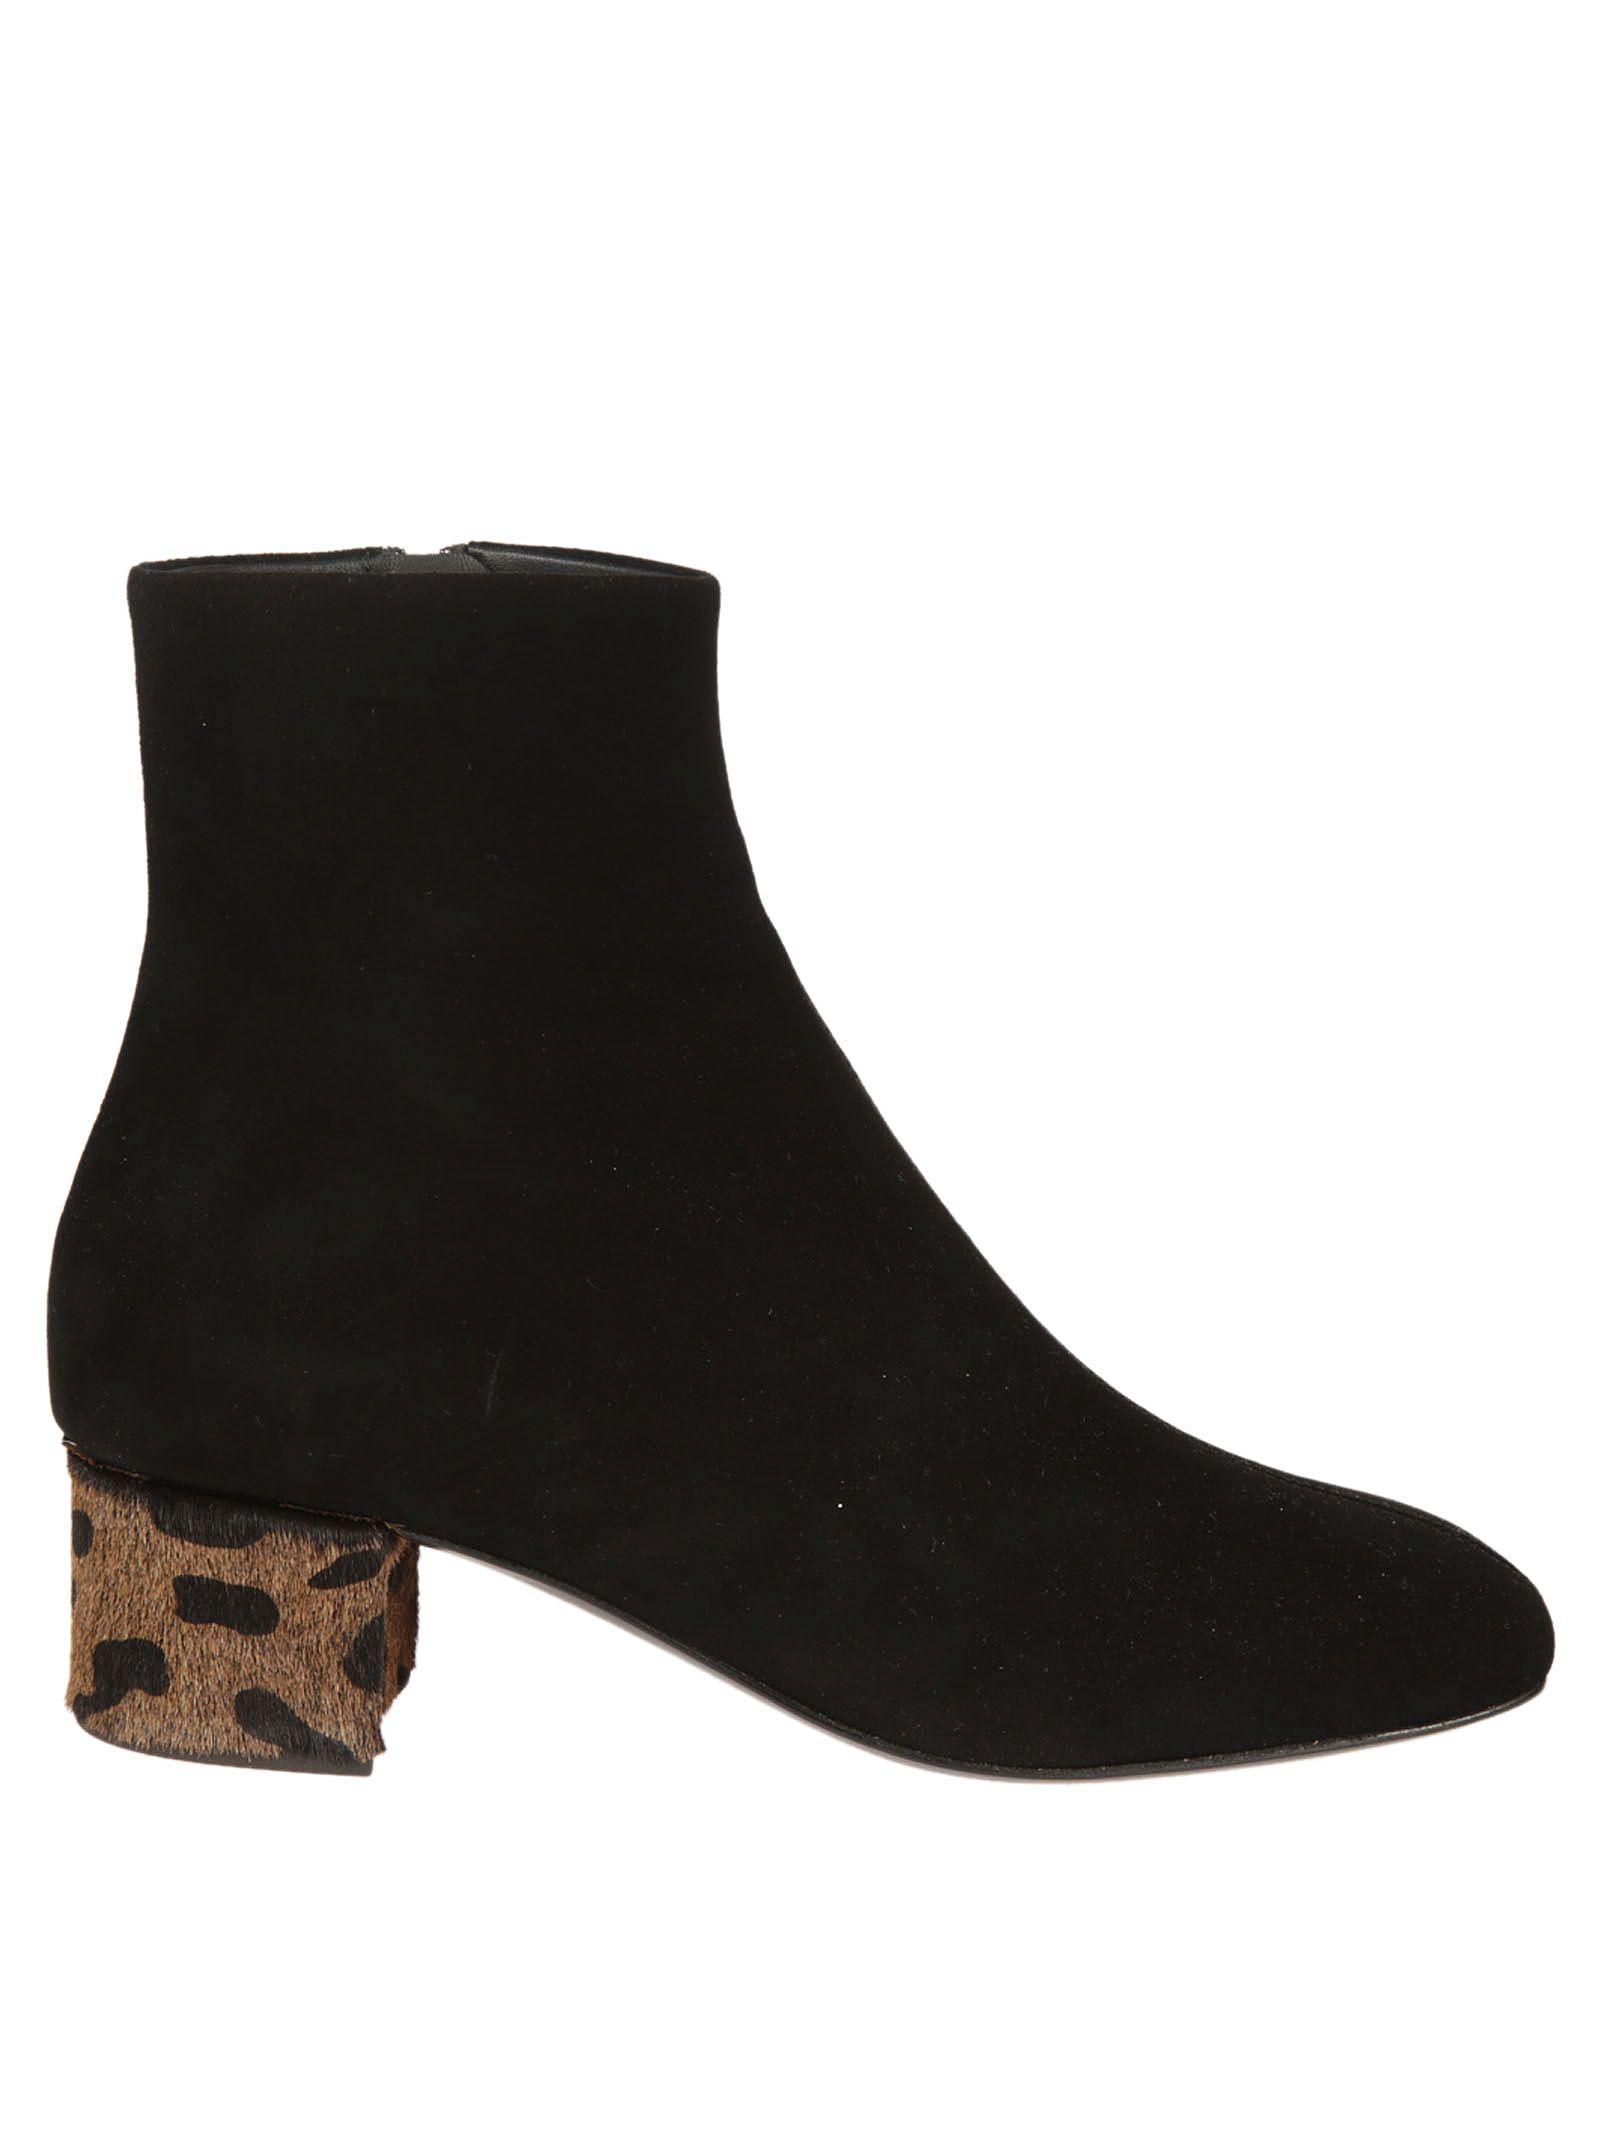 Giuseppe Zanotti Giuseppe Zanotti Pretty Ankle Boots